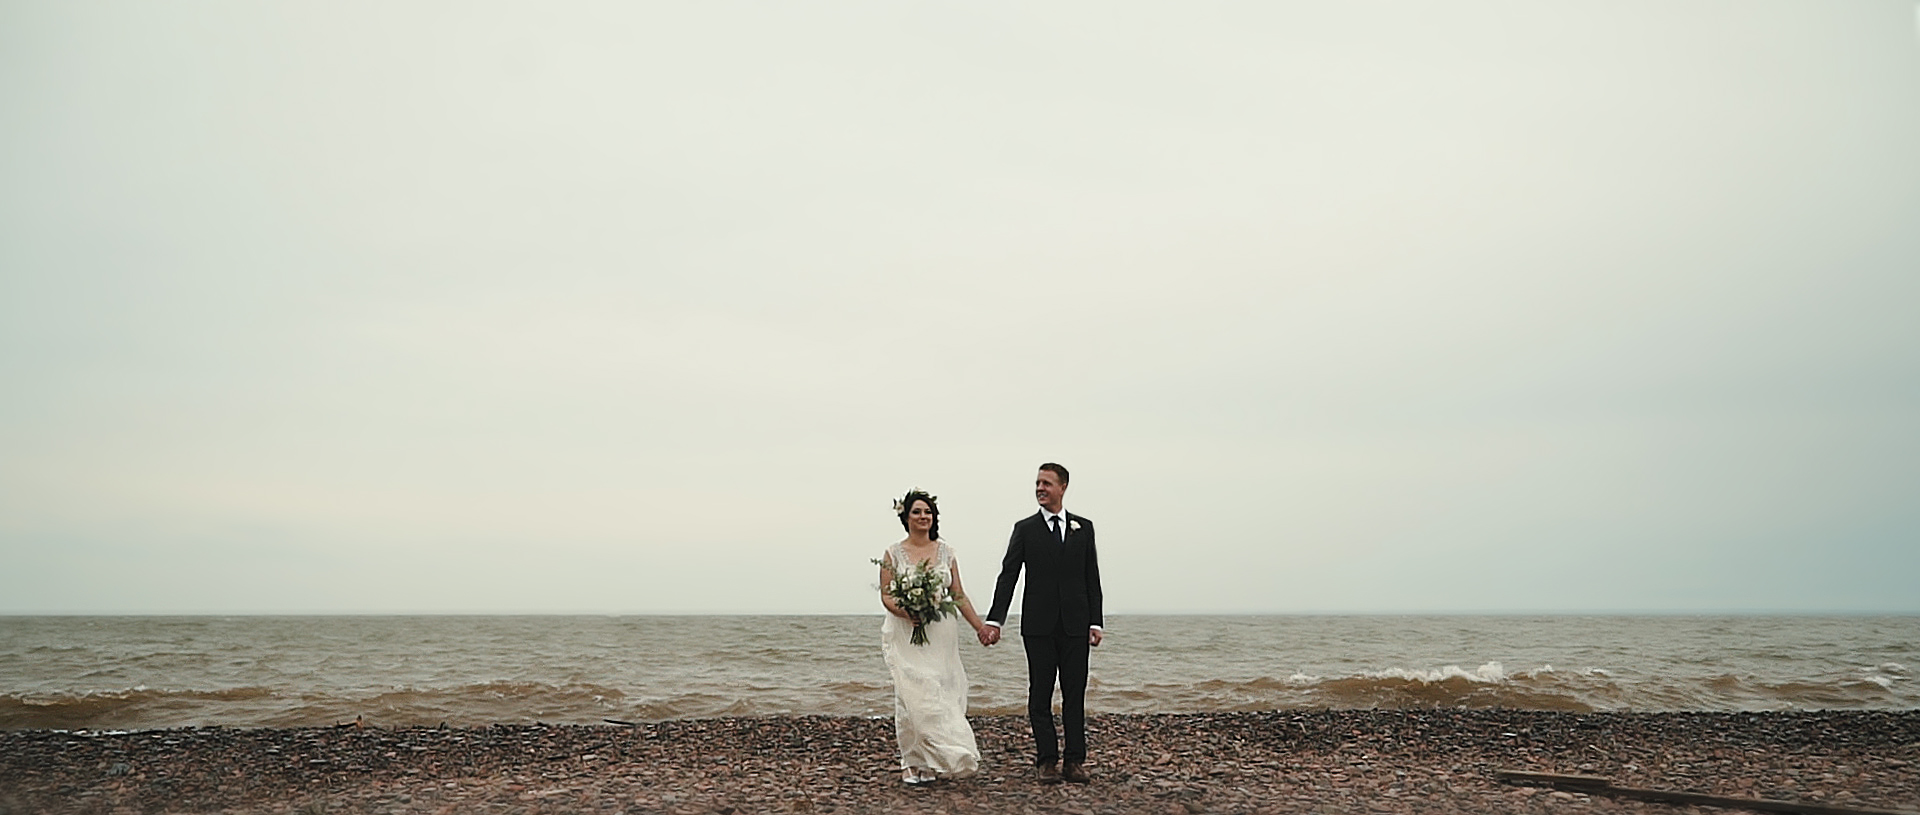 wedding film maker Minnesota